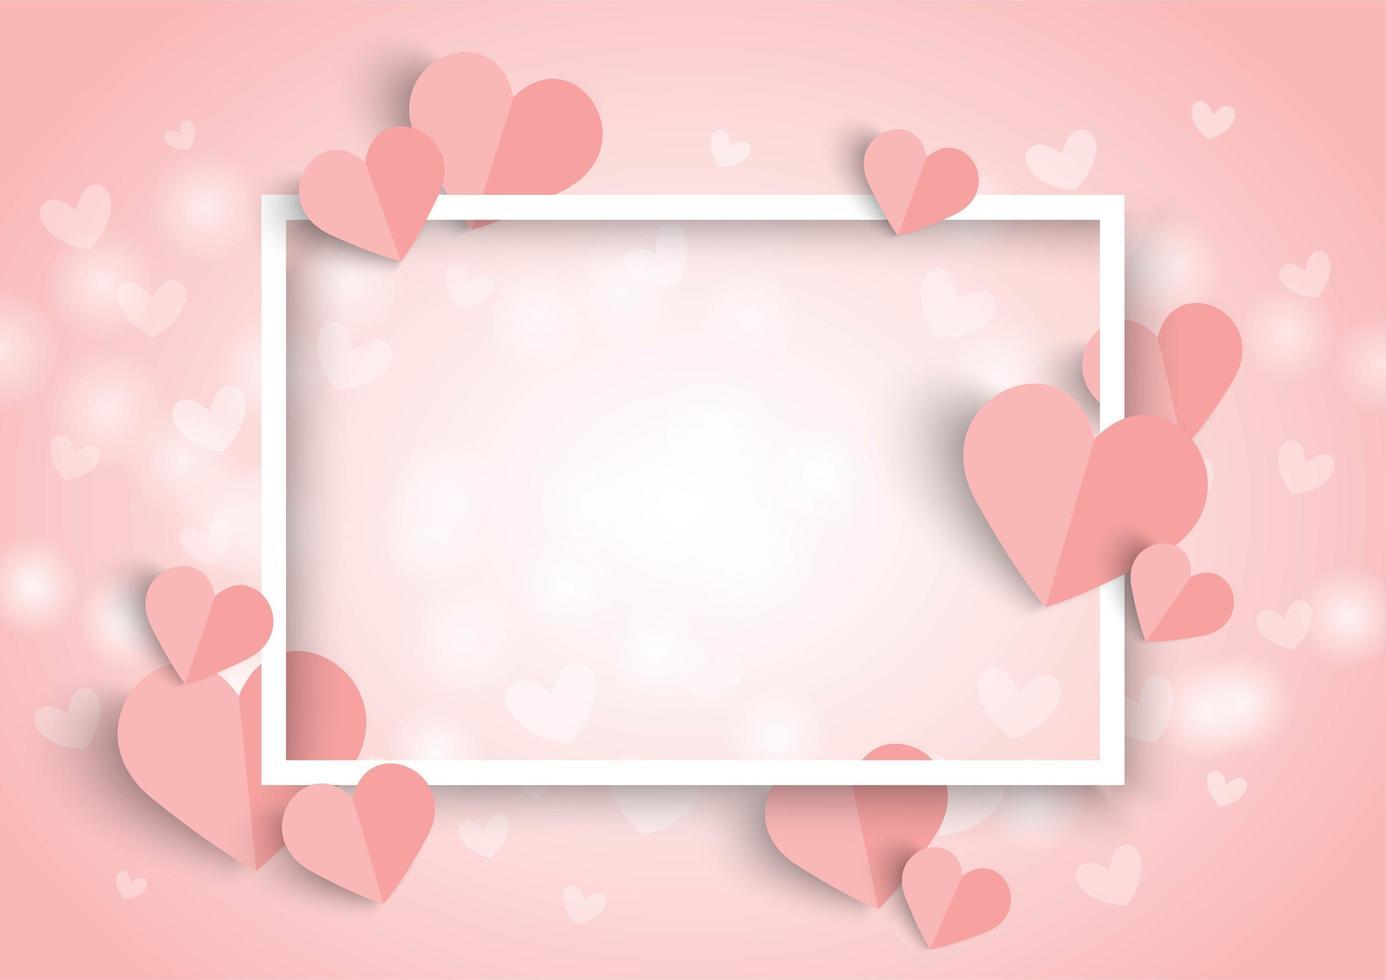 Valentines roze hart achtergrond, wit frame en papier gesneden hart vorm vector